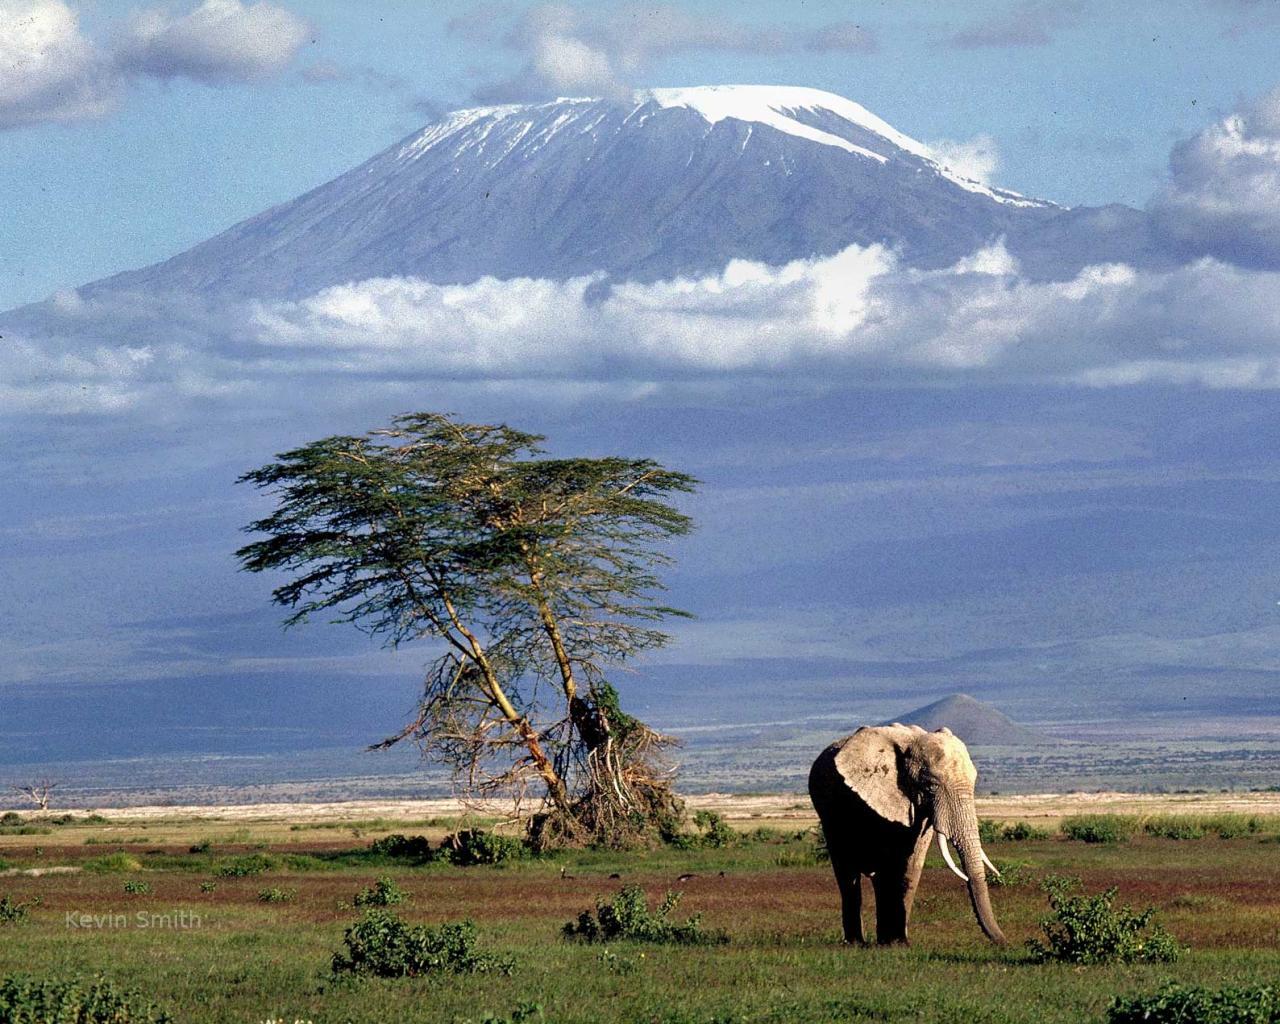 Kilimanjaro-mountain.jpg